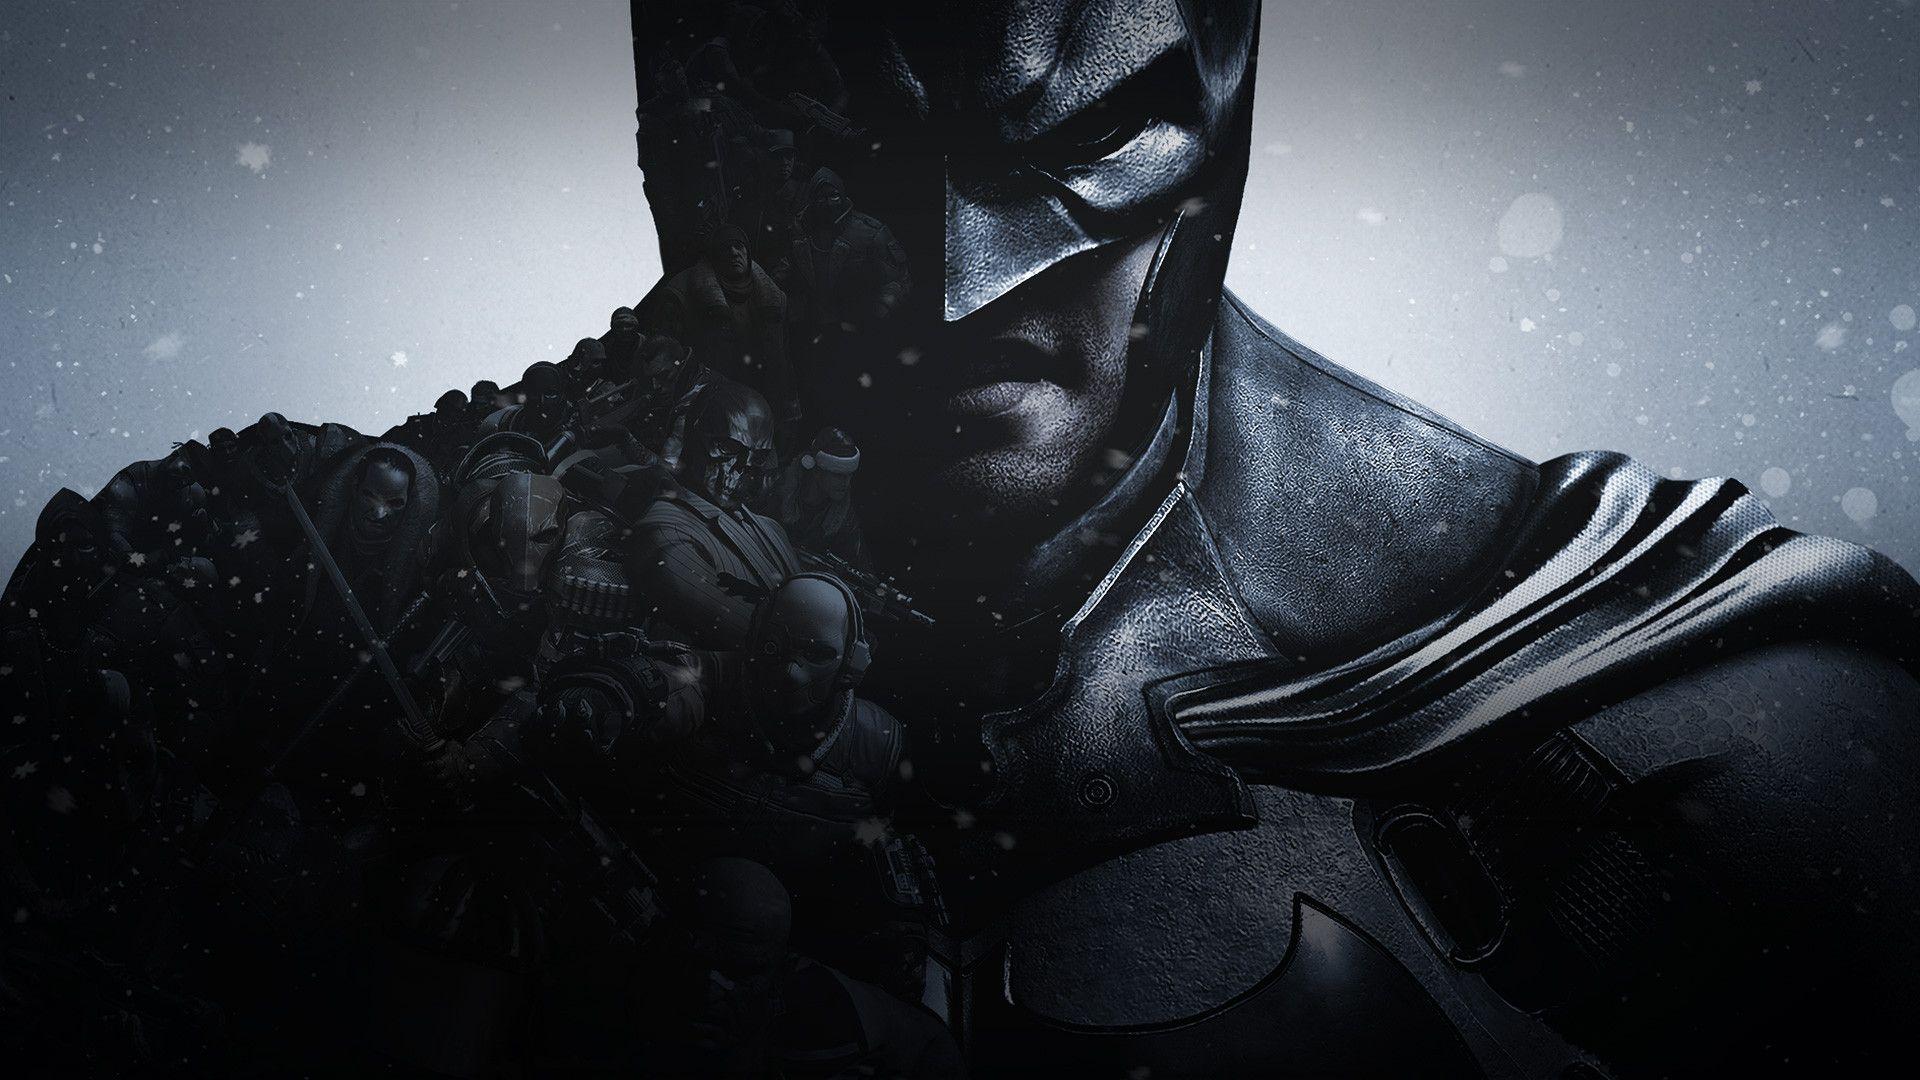 movie wallpaper batman vs superman desktop wallpaper wallpaper hd